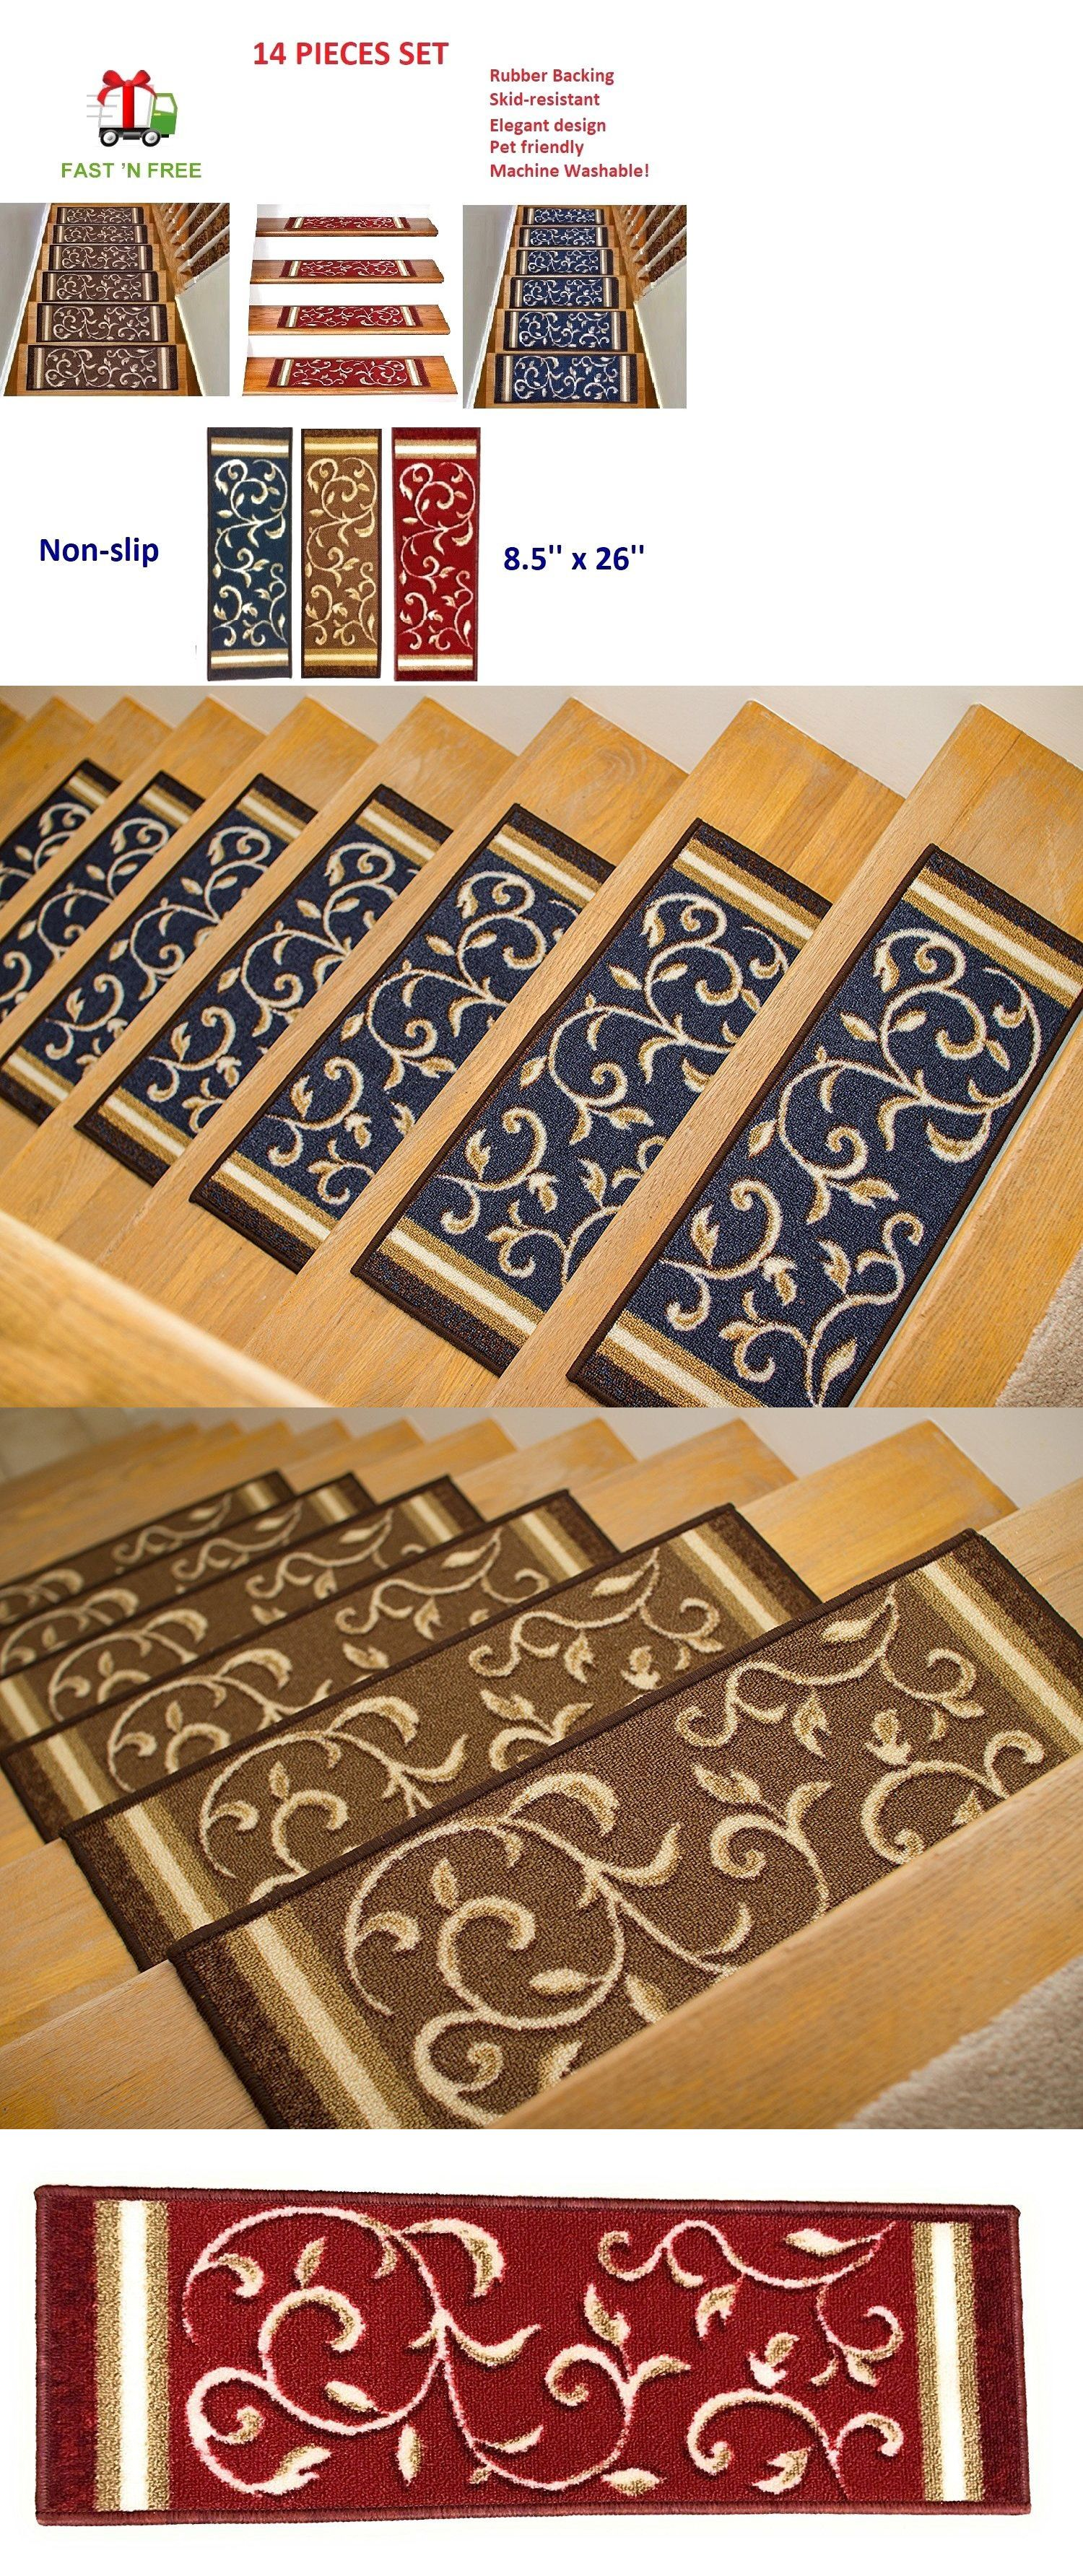 Details About 16 Pcs Non Slip Quality Carpet Stair Treads   Non Skid Carpet Stair Treads   Stair Runner   Bullnose Carpet   Flooring   Adhesive   Amazon